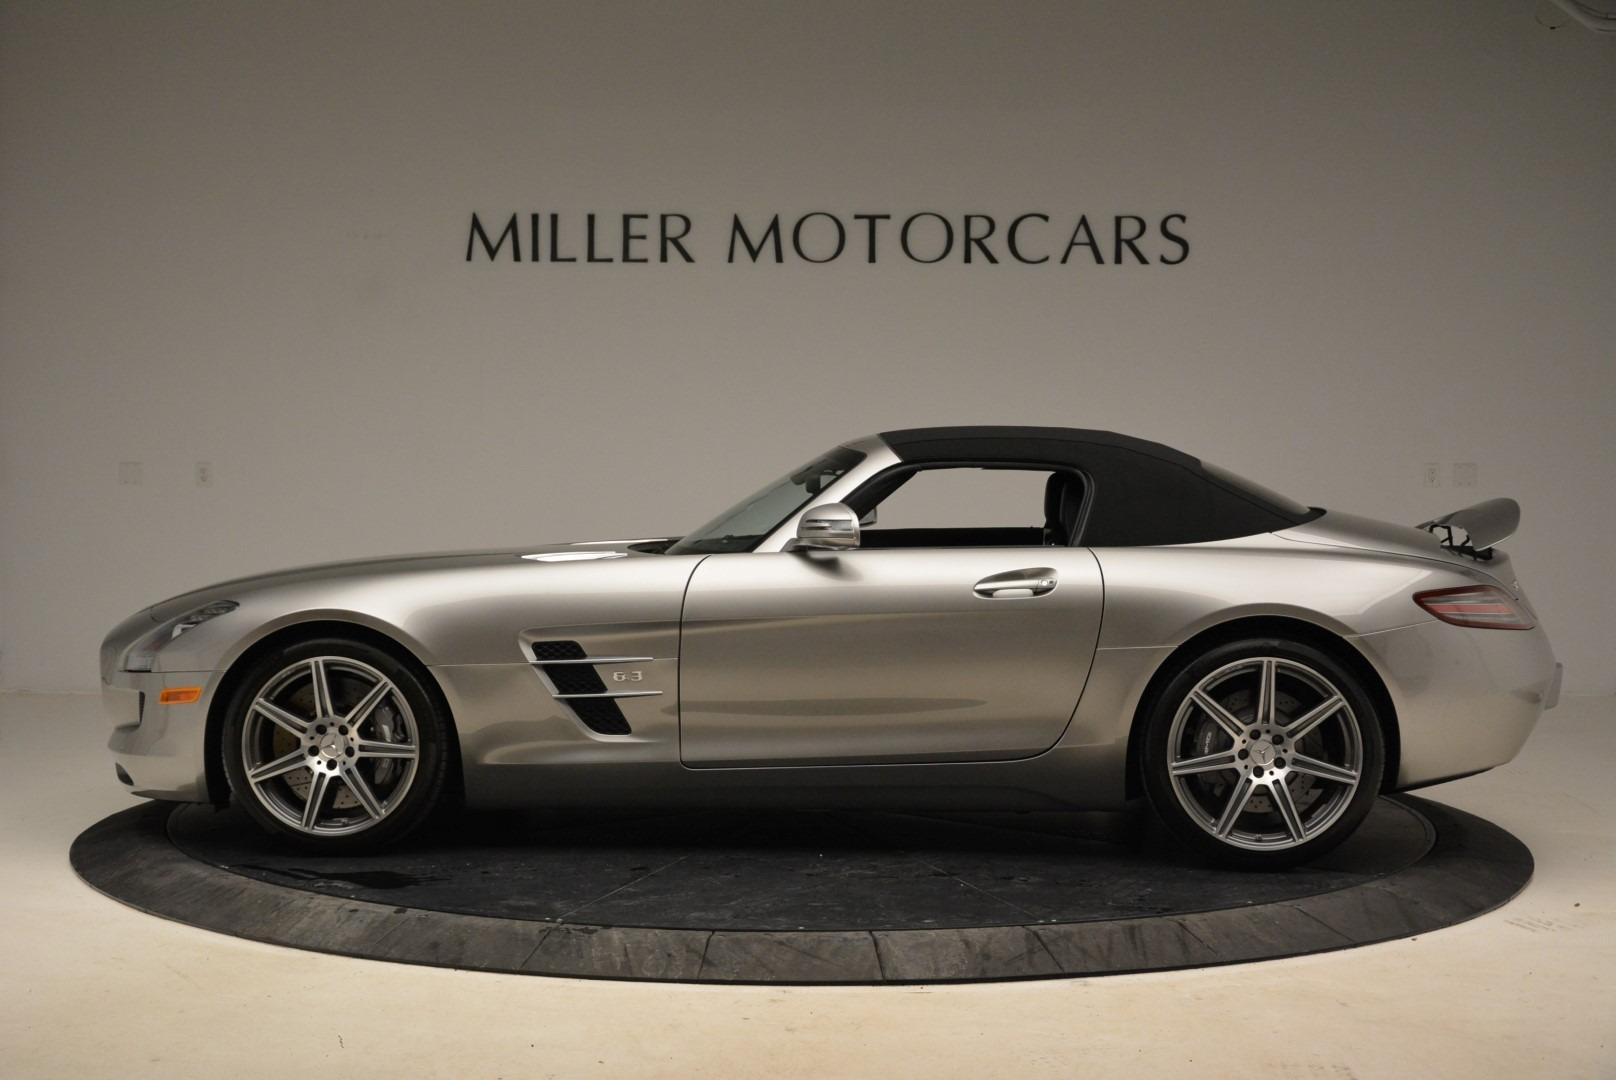 Used 2012 Mercedes-Benz SLS AMG  For Sale In Westport, CT 2068_p14